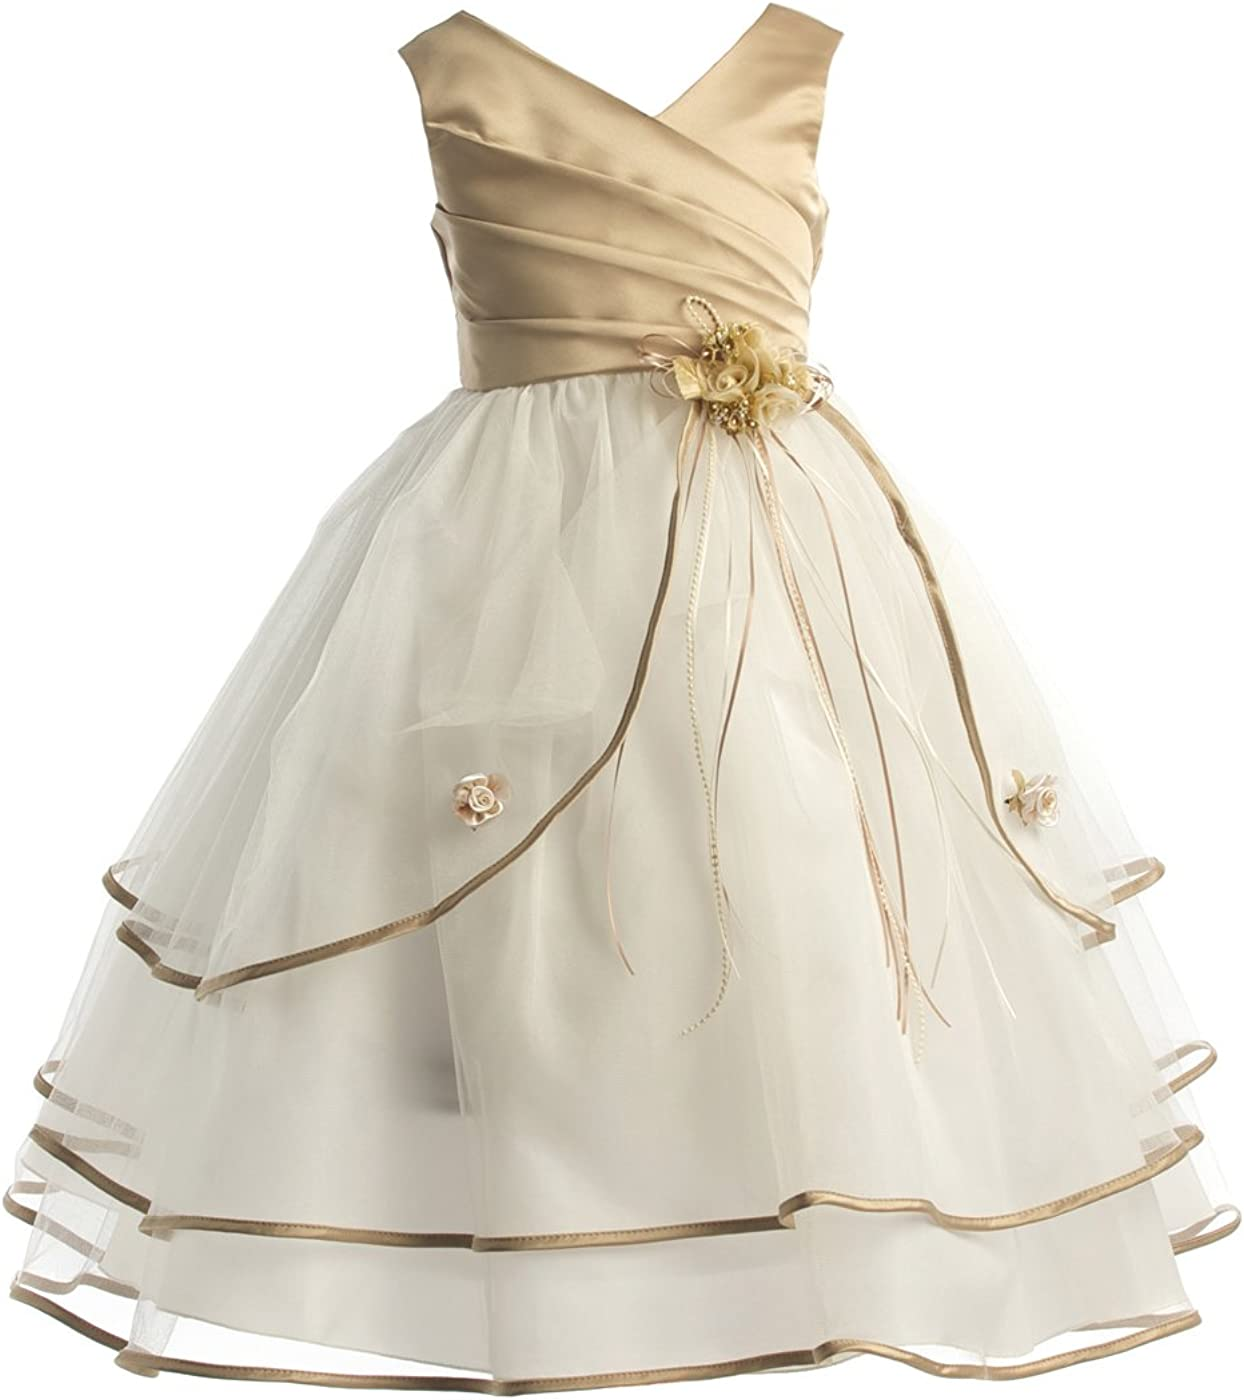 Joy Kids Girls Pleated Satin Special Occasion Flower Girl Dress Sizes 2 To 16